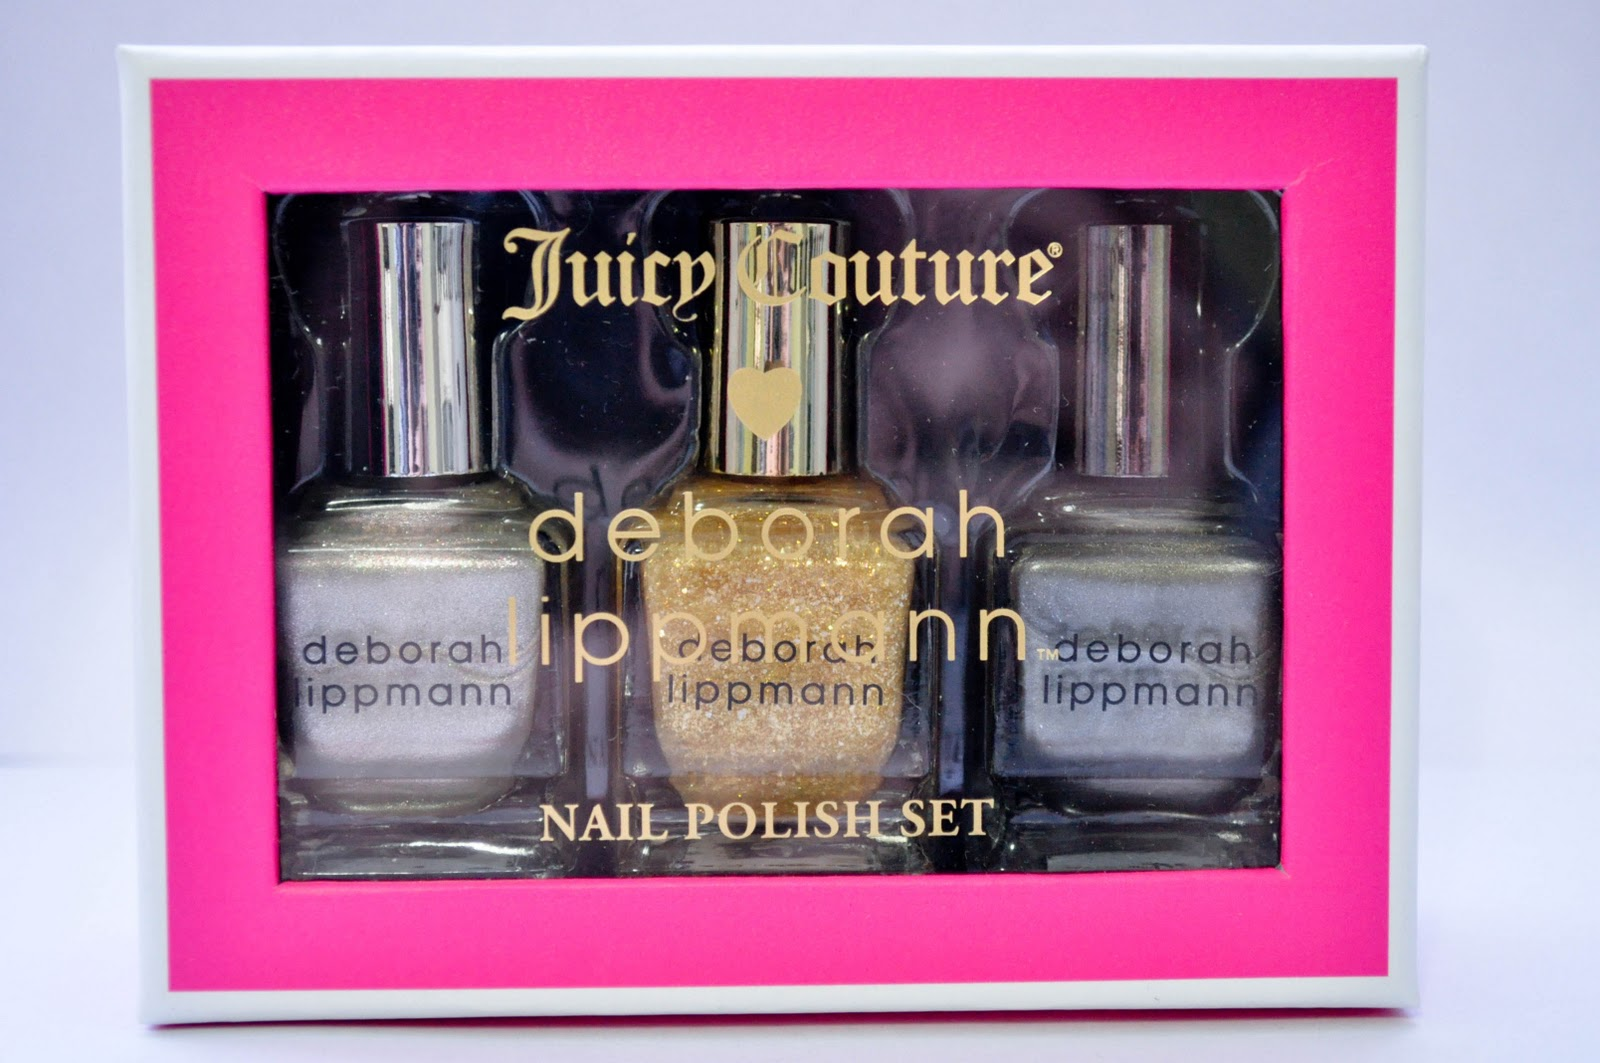 Nail Art Paradise: Juicy Couture x deborah lippmann - Precious Metals